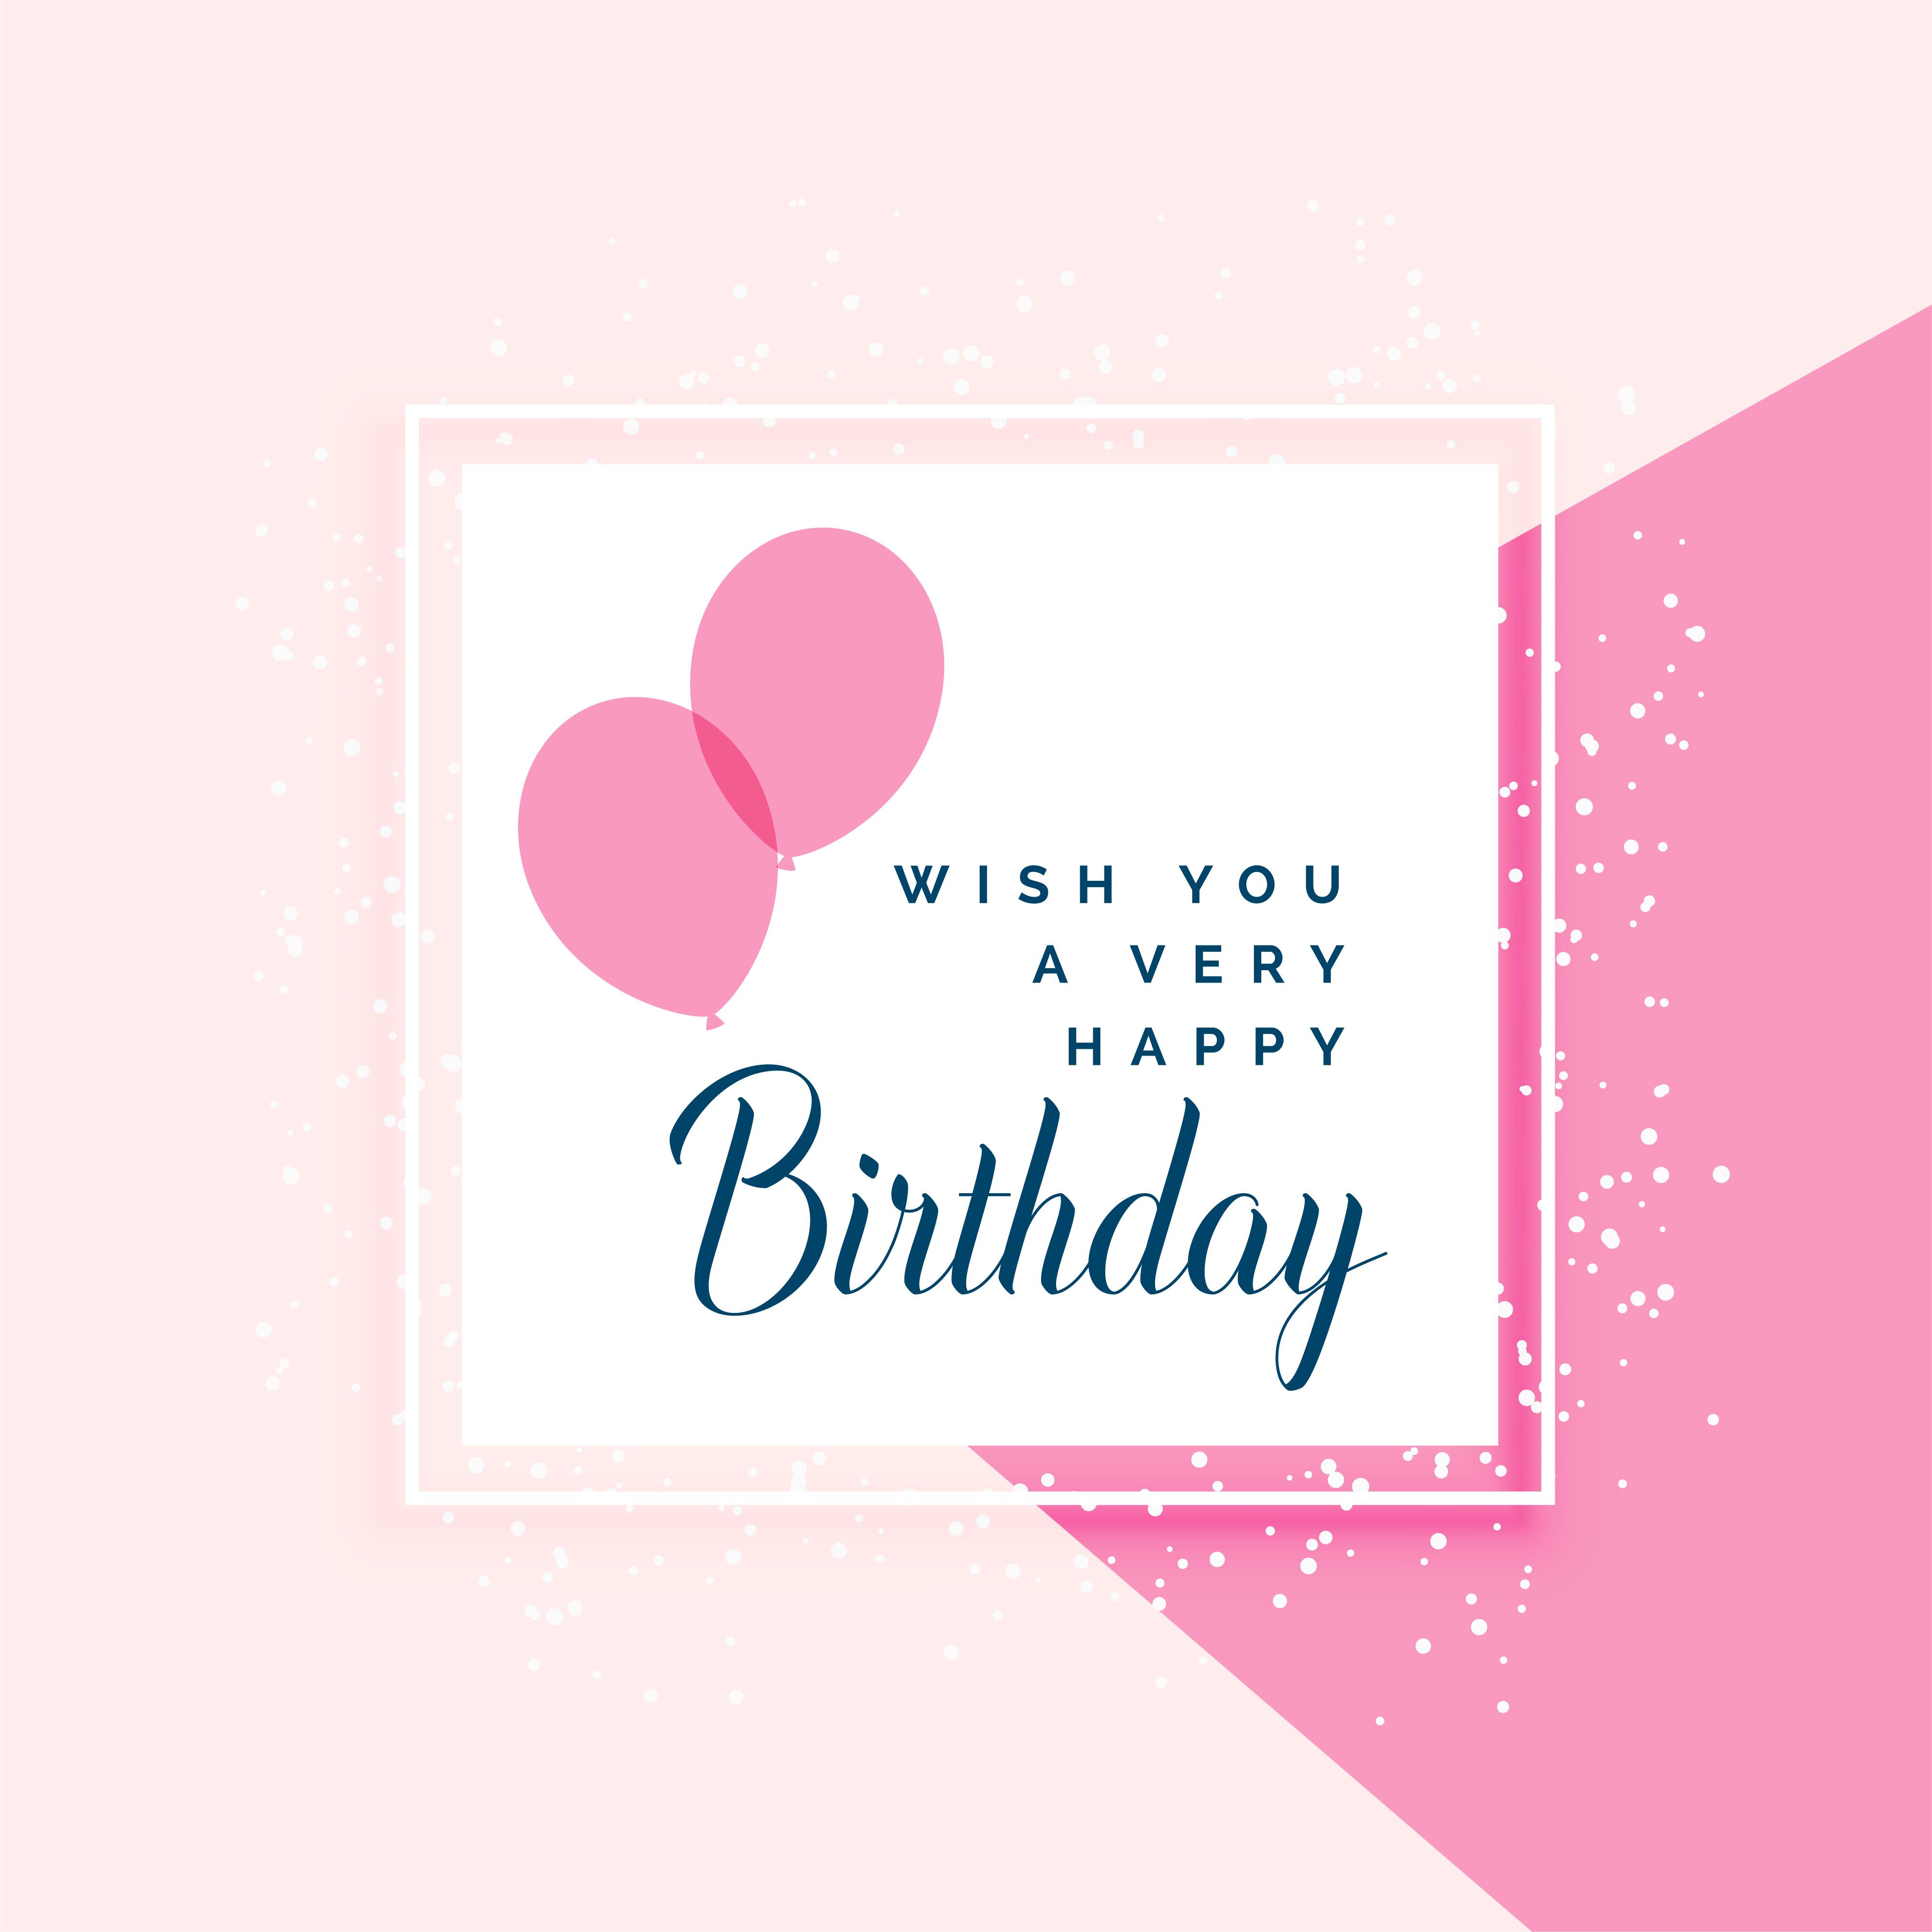 Elegant Pink Happy Birthday Greeting Design Download Free Vector